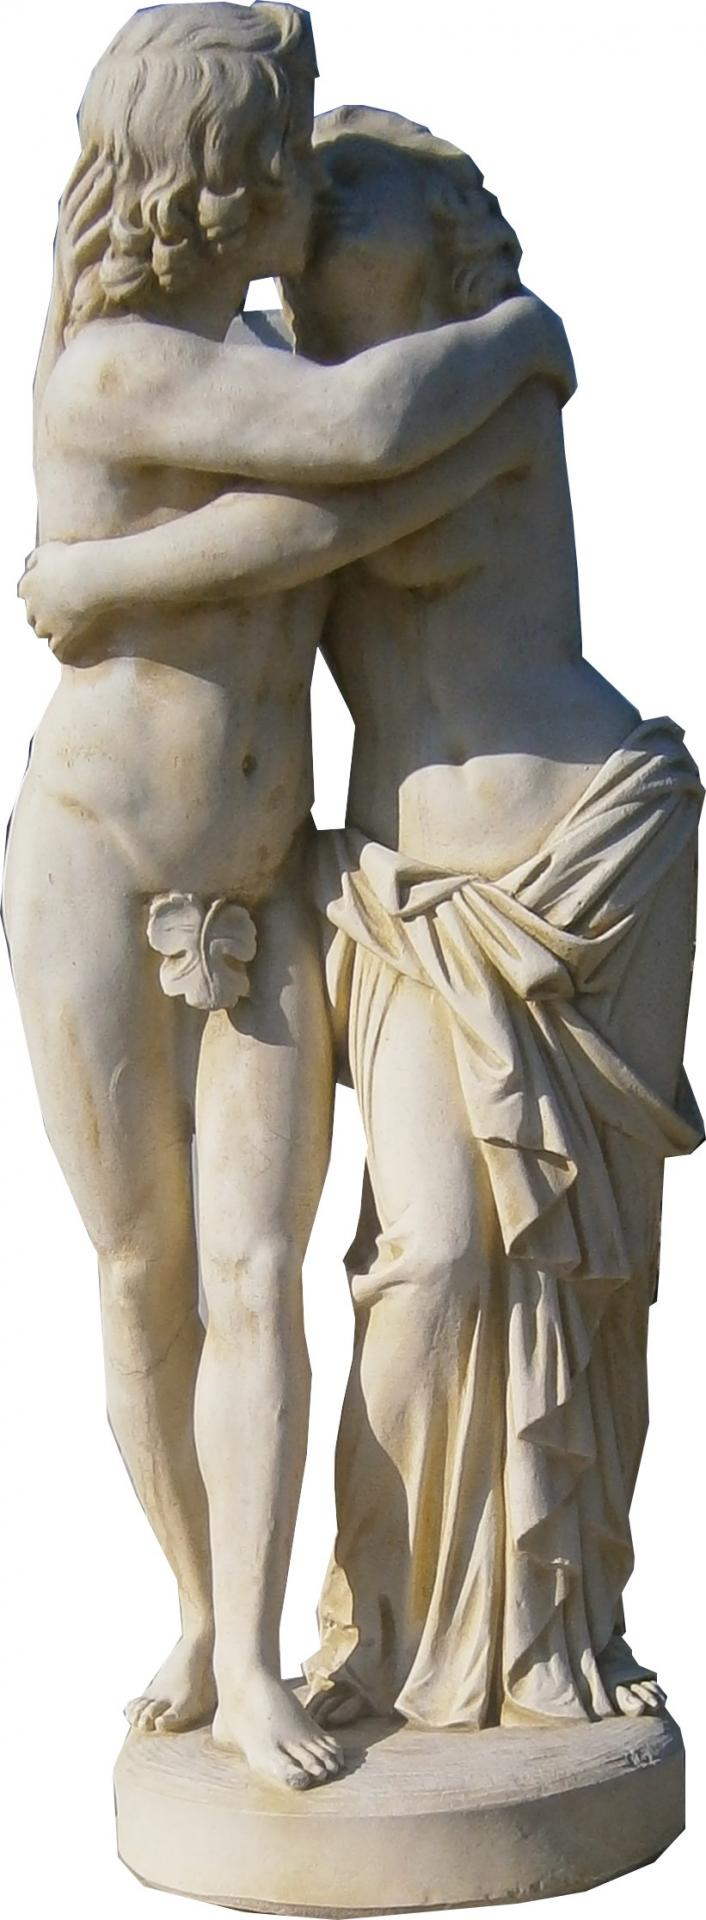 Statut amoureux